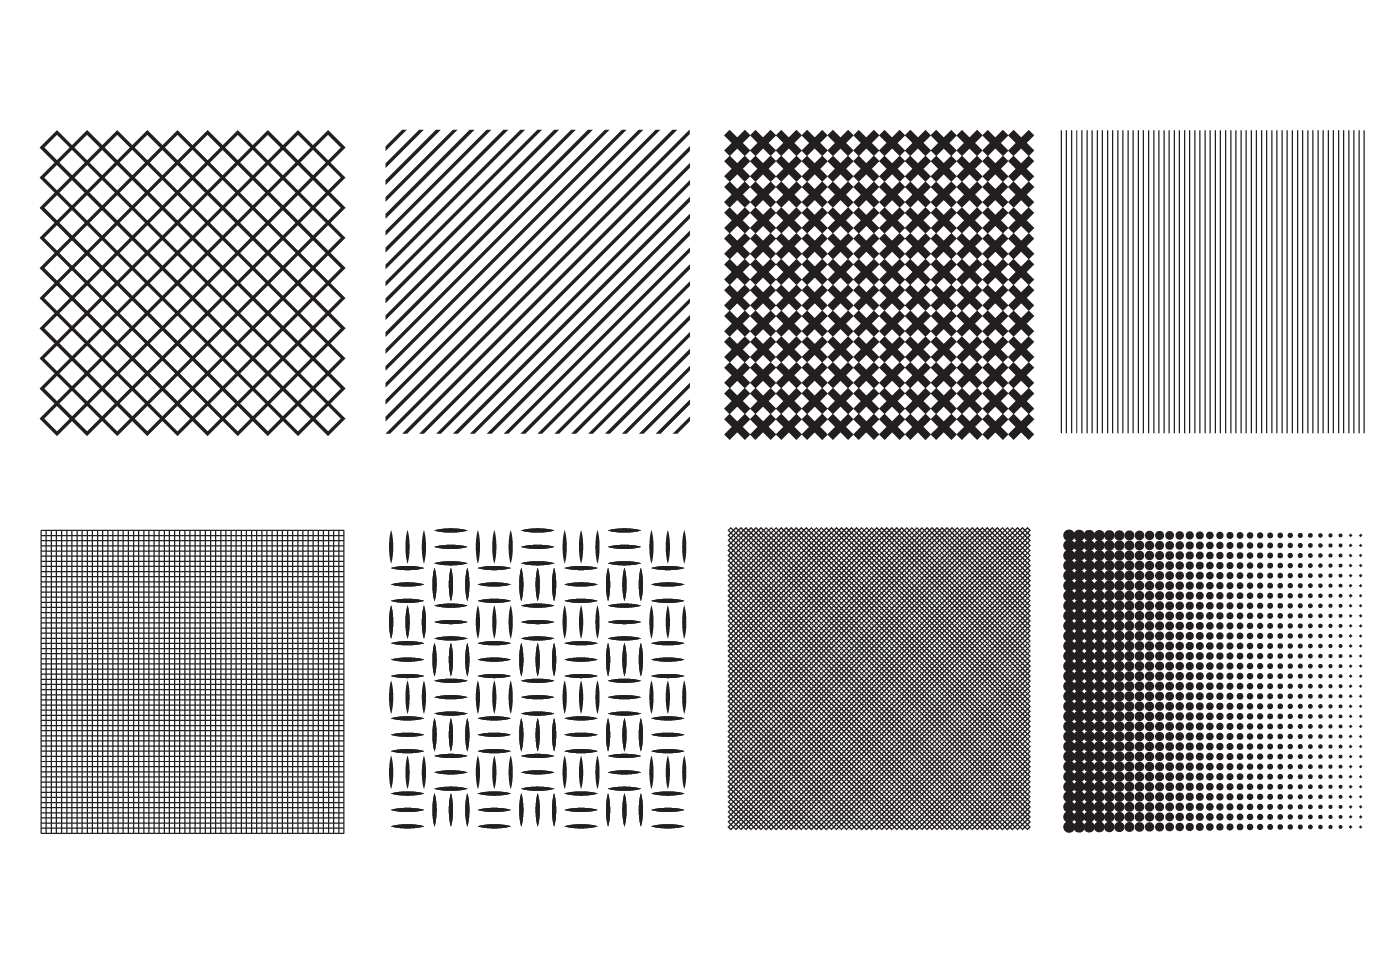 Crosshatch Pattern Free Vector Art - (34 Free Downloads)